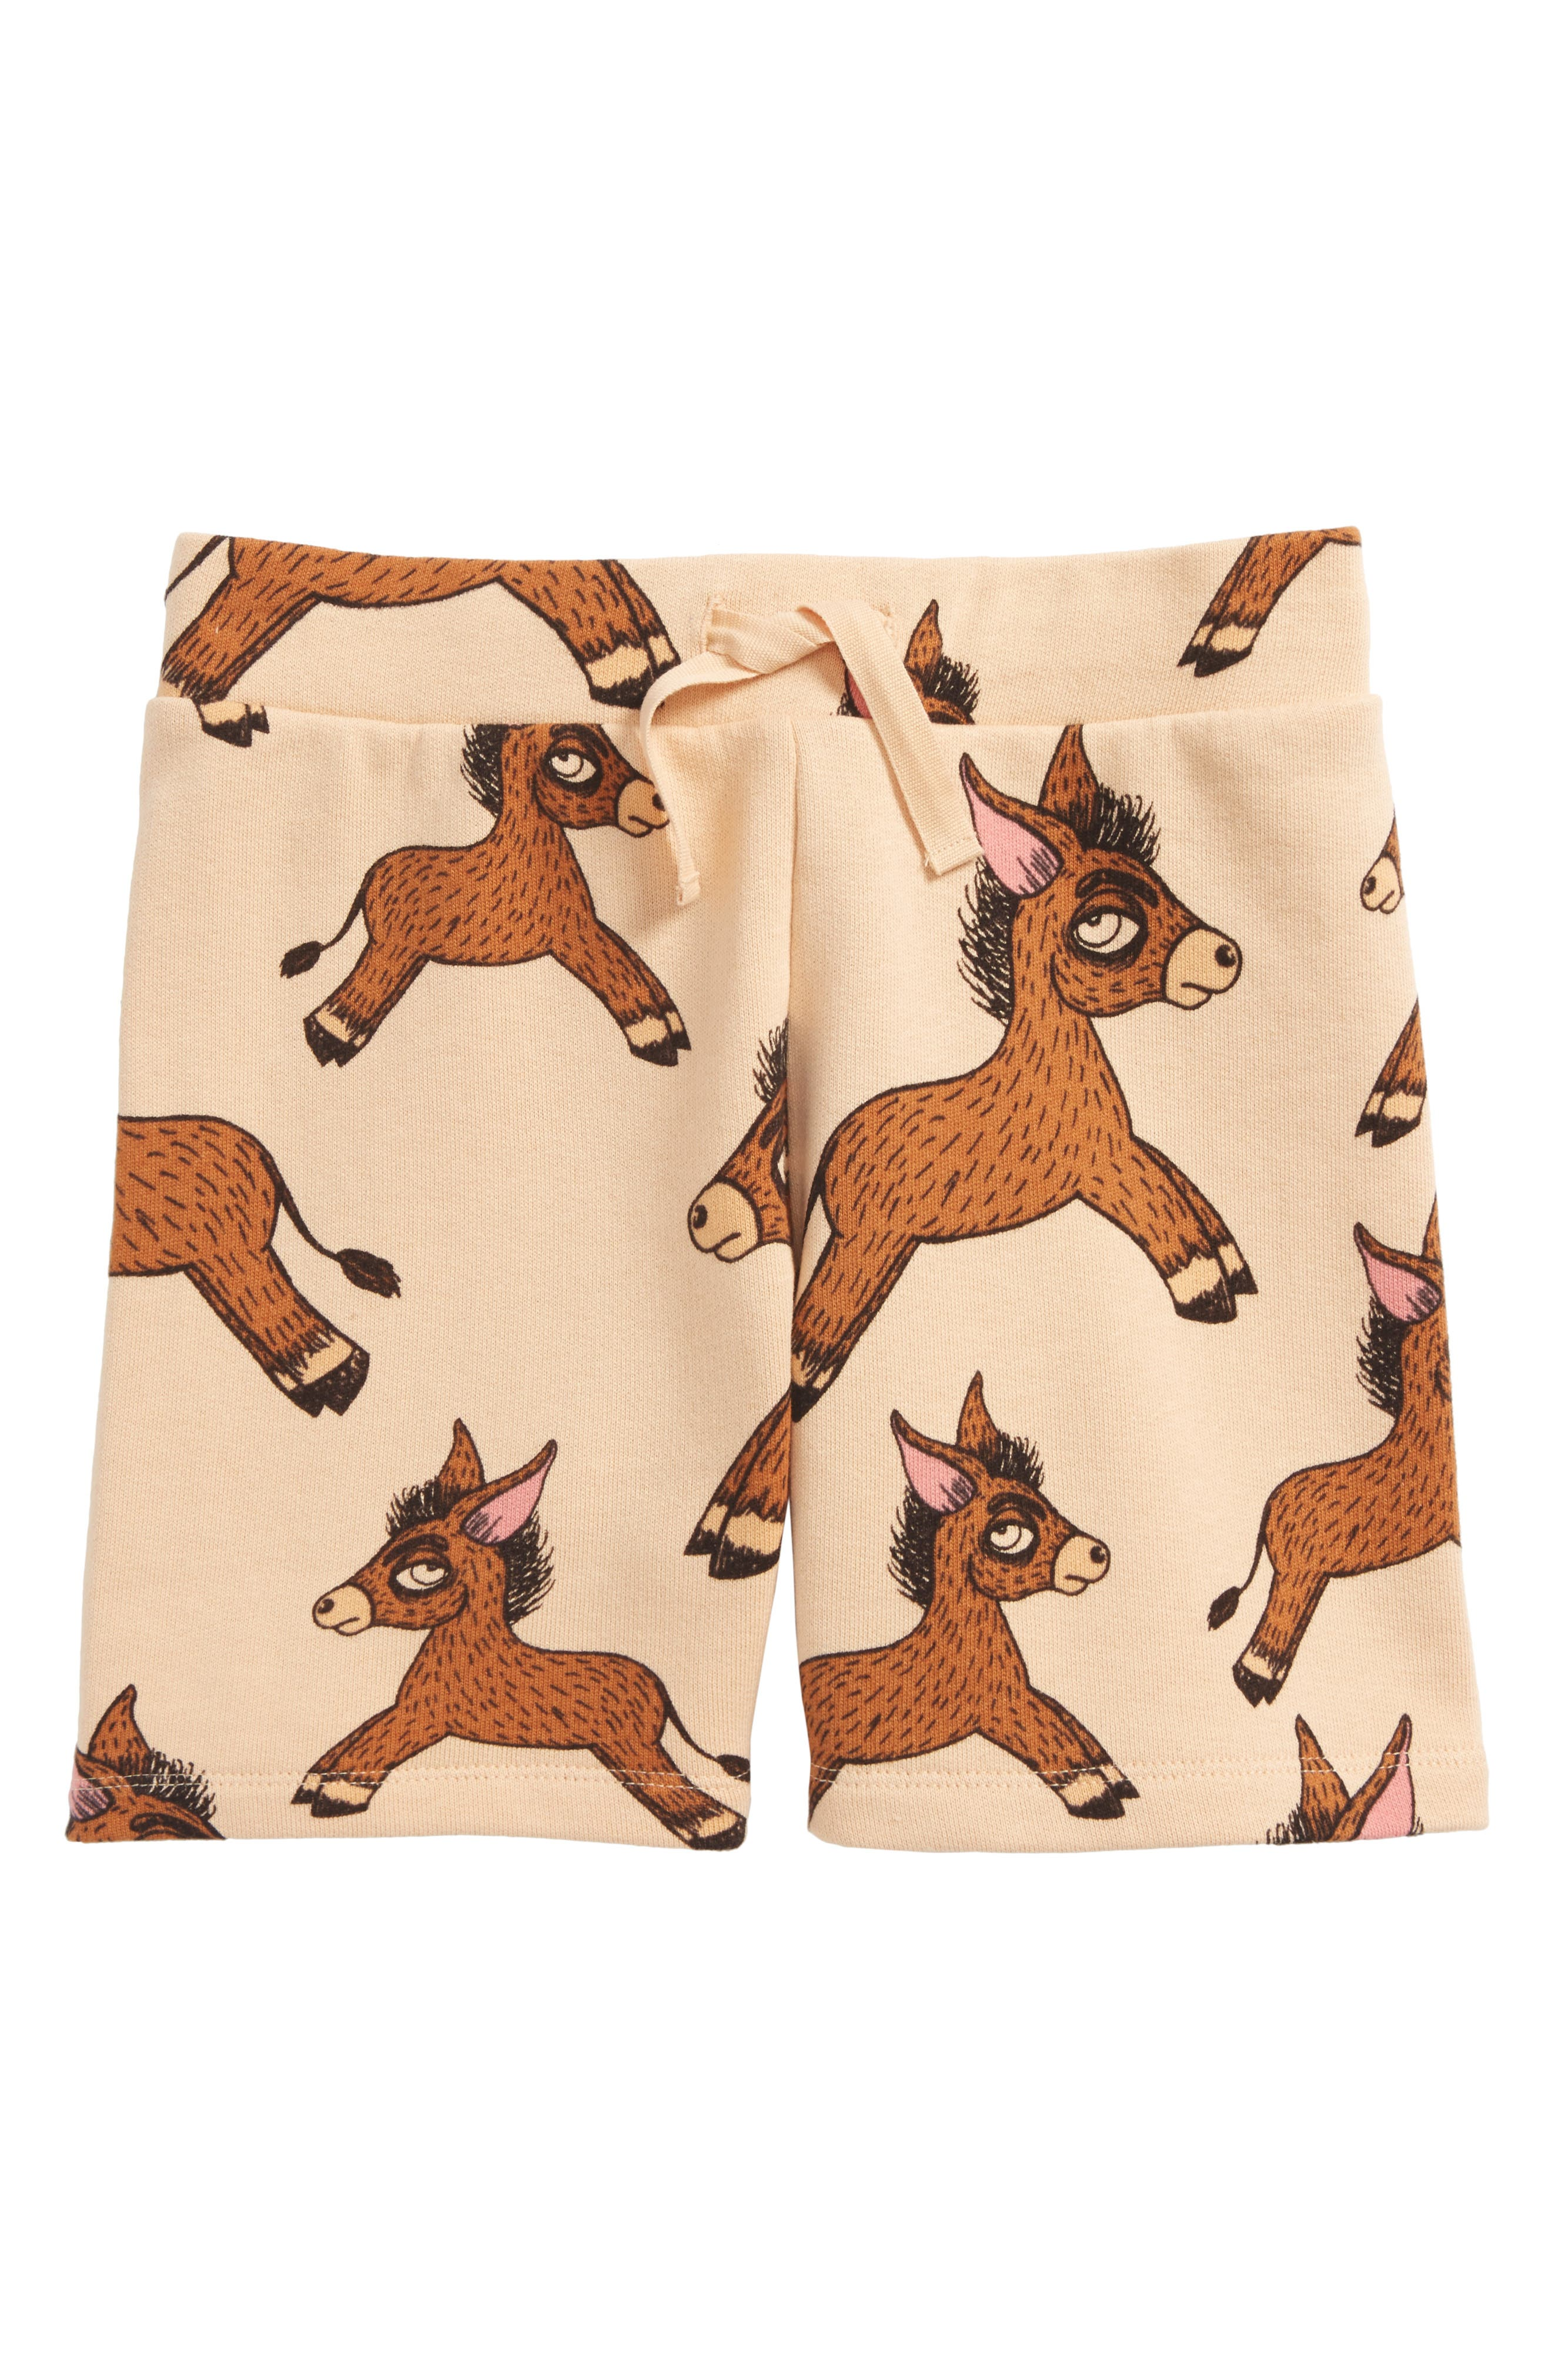 Donkey Print Organic Cotton Sweat Shorts,                             Main thumbnail 1, color,                             250